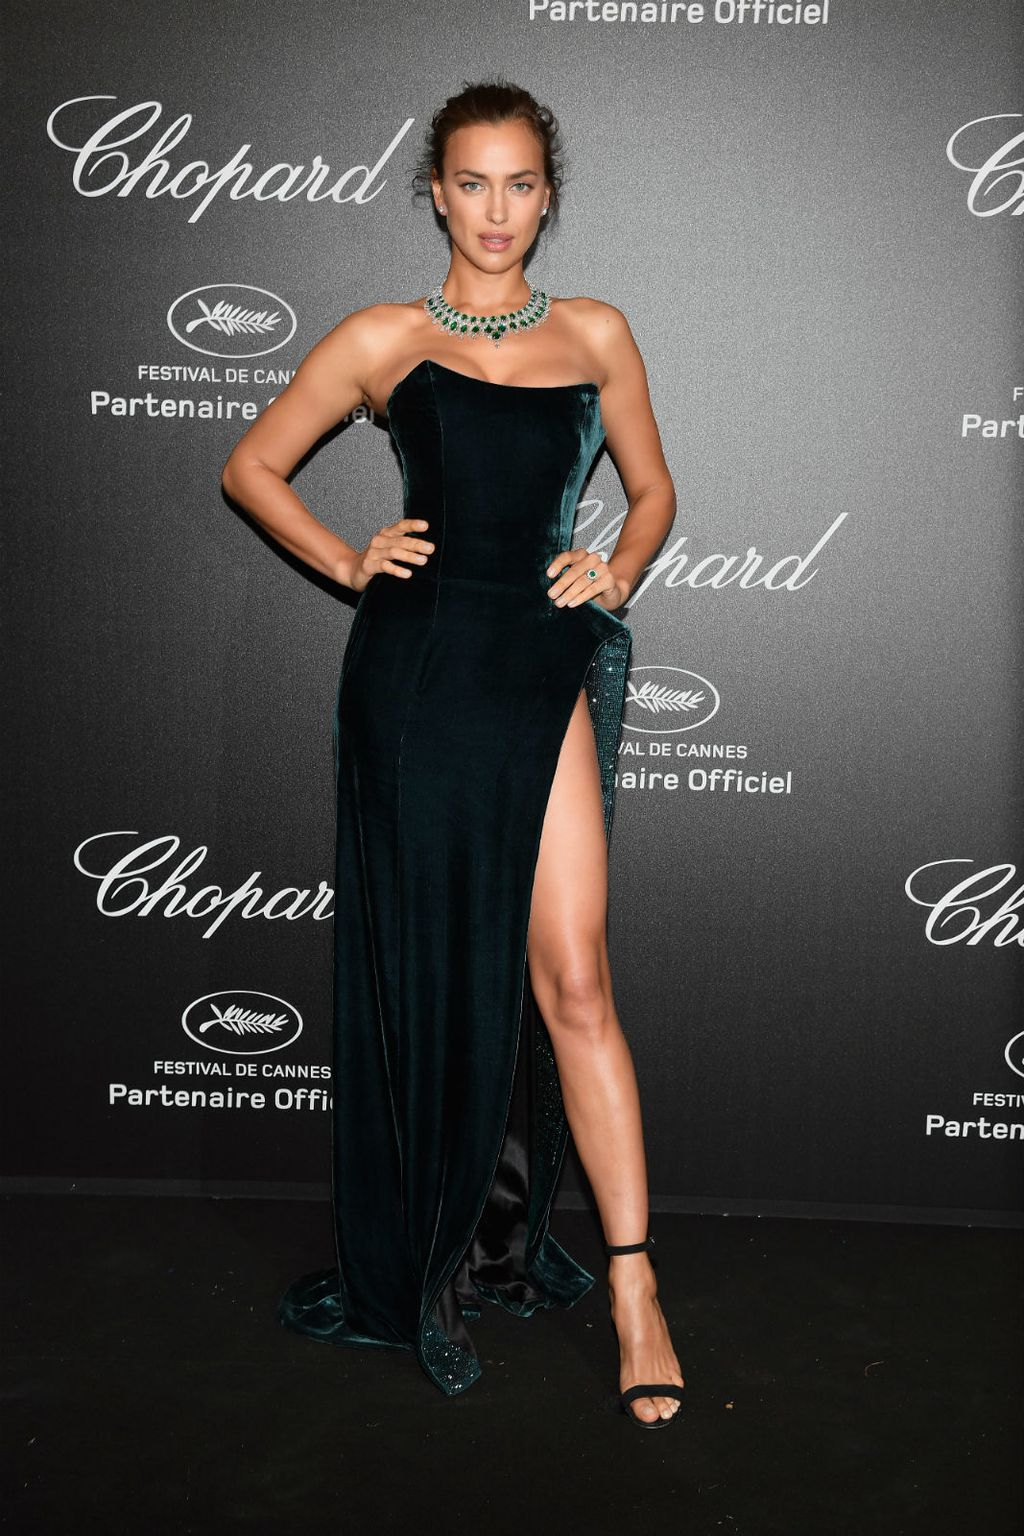 Slavne dame na Chopard partyju u Cannesu - 5